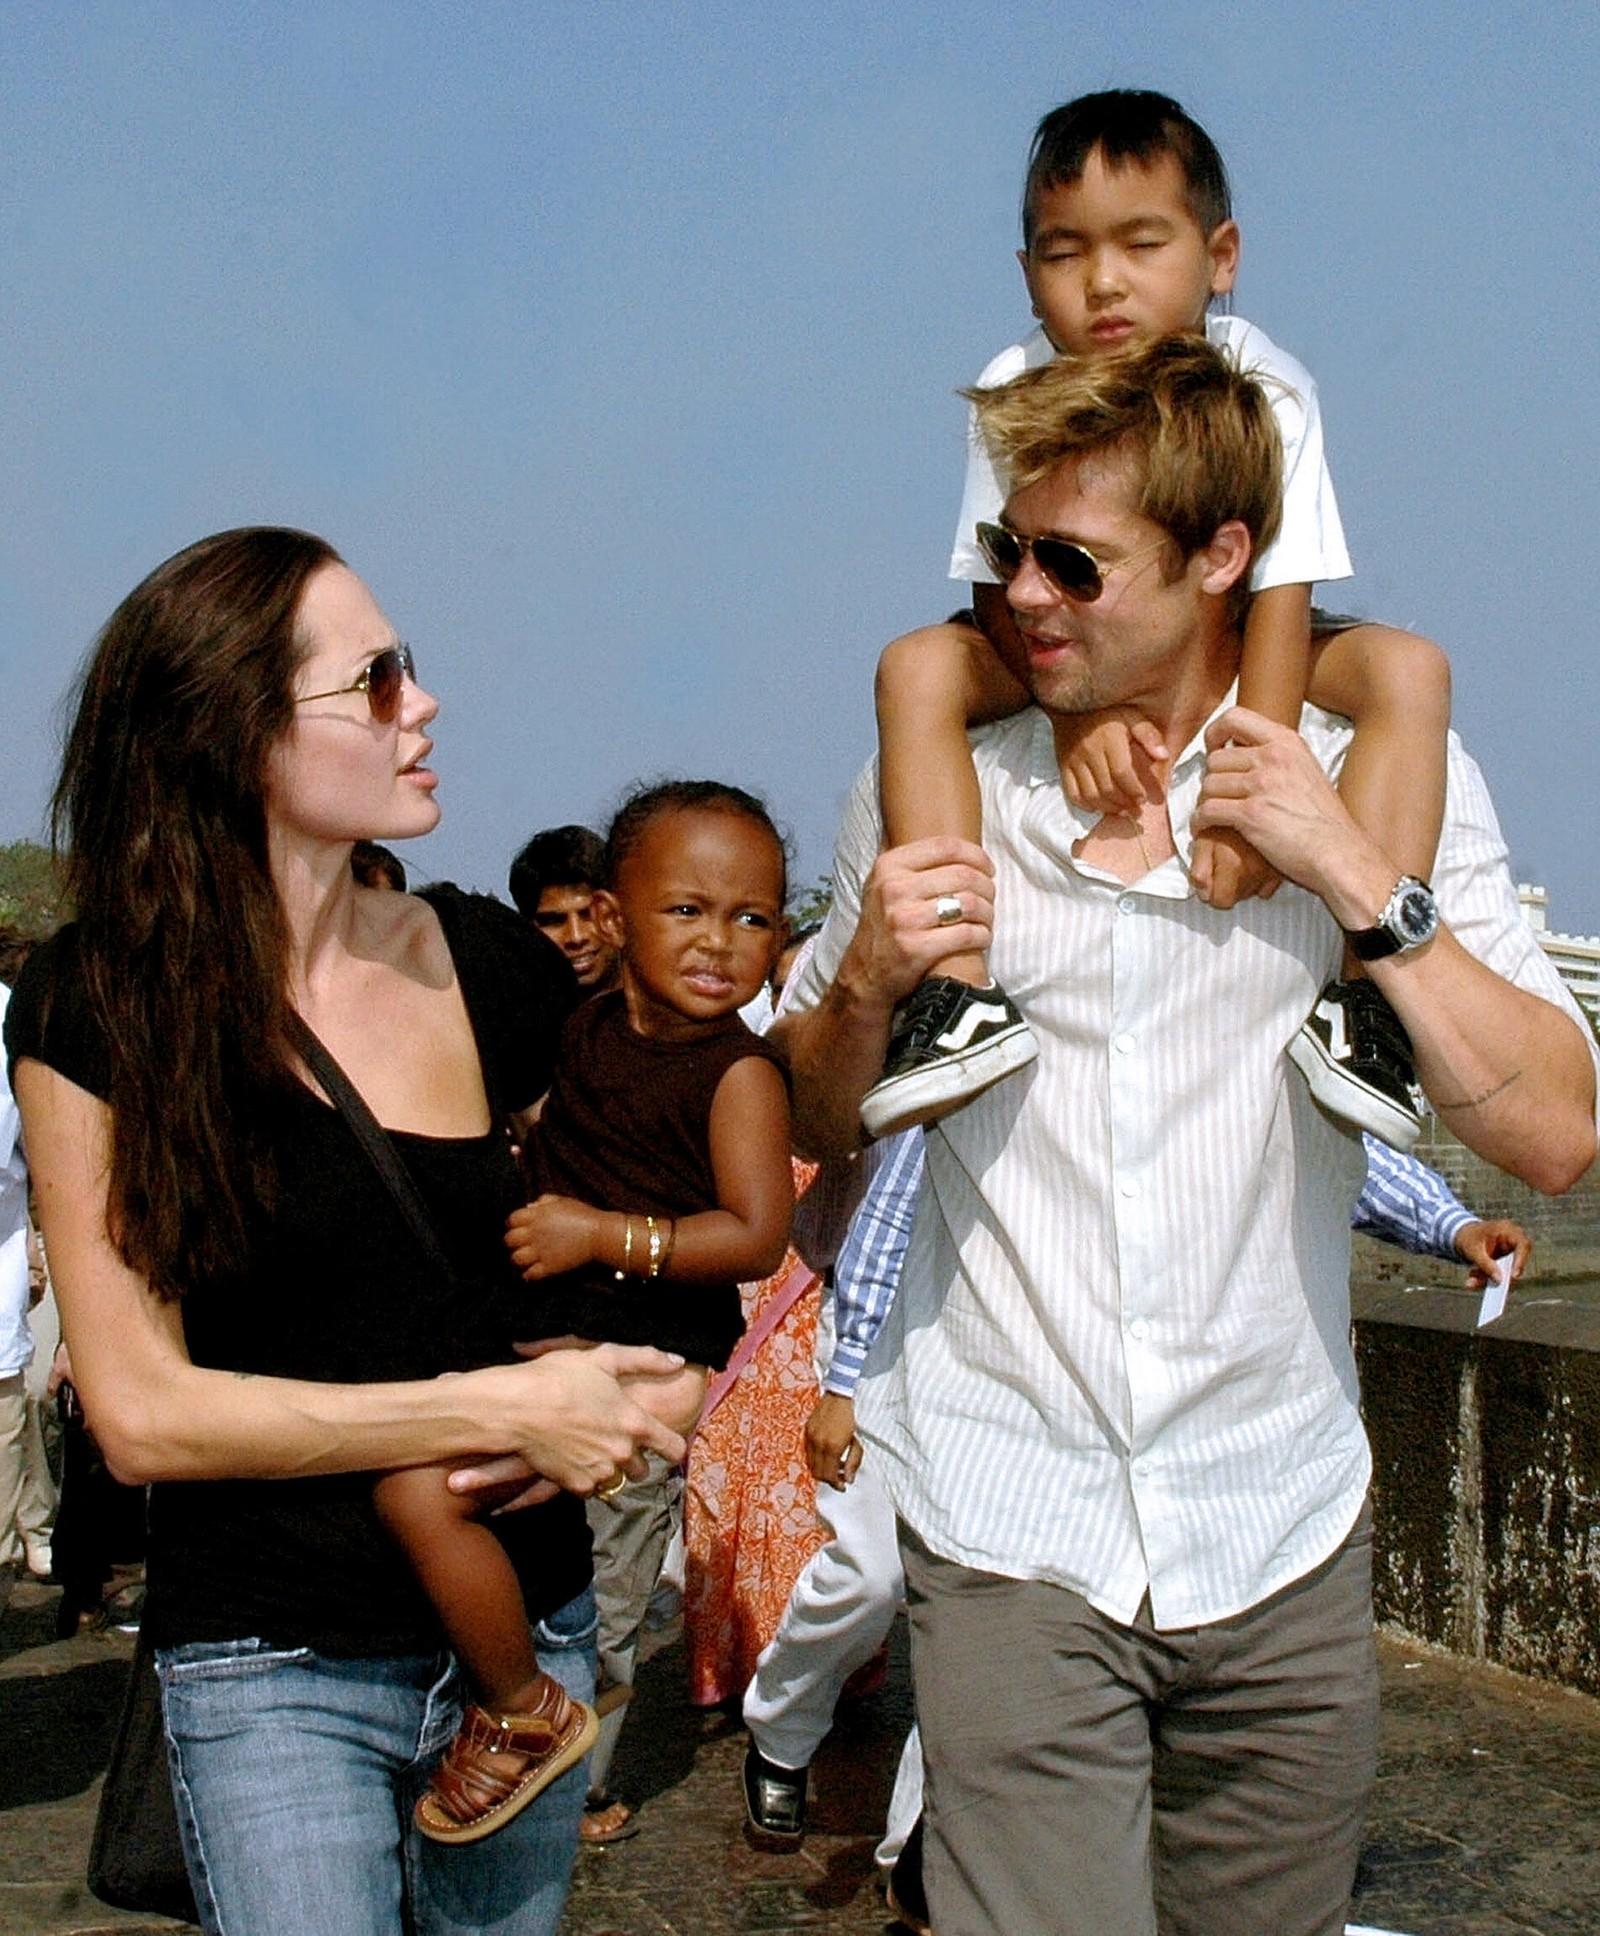 UNHRC-ambassadør Angelina Jolie sammen med datteren Zahara og Brad Pitt med Jolies sønn Maddox i Mumbai India i 2006.